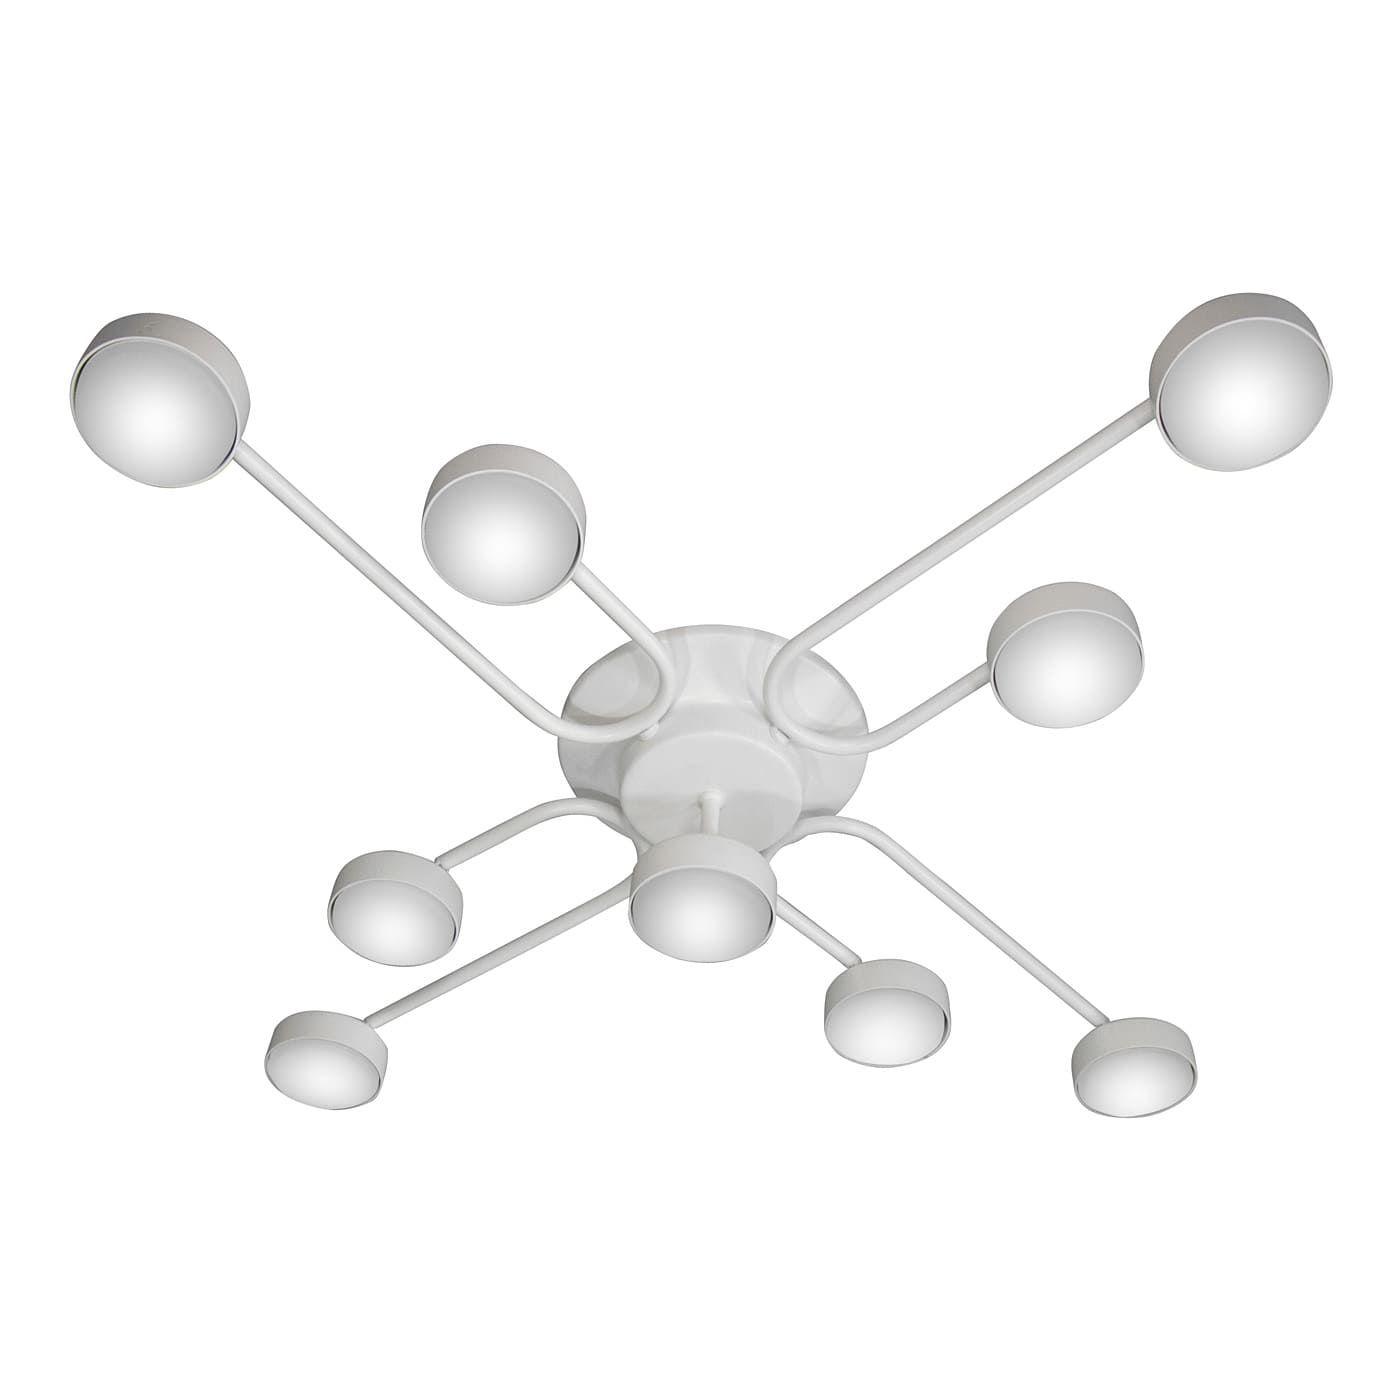 PETRASVET / Ceiling chandelier S2403-9, 9xGX53